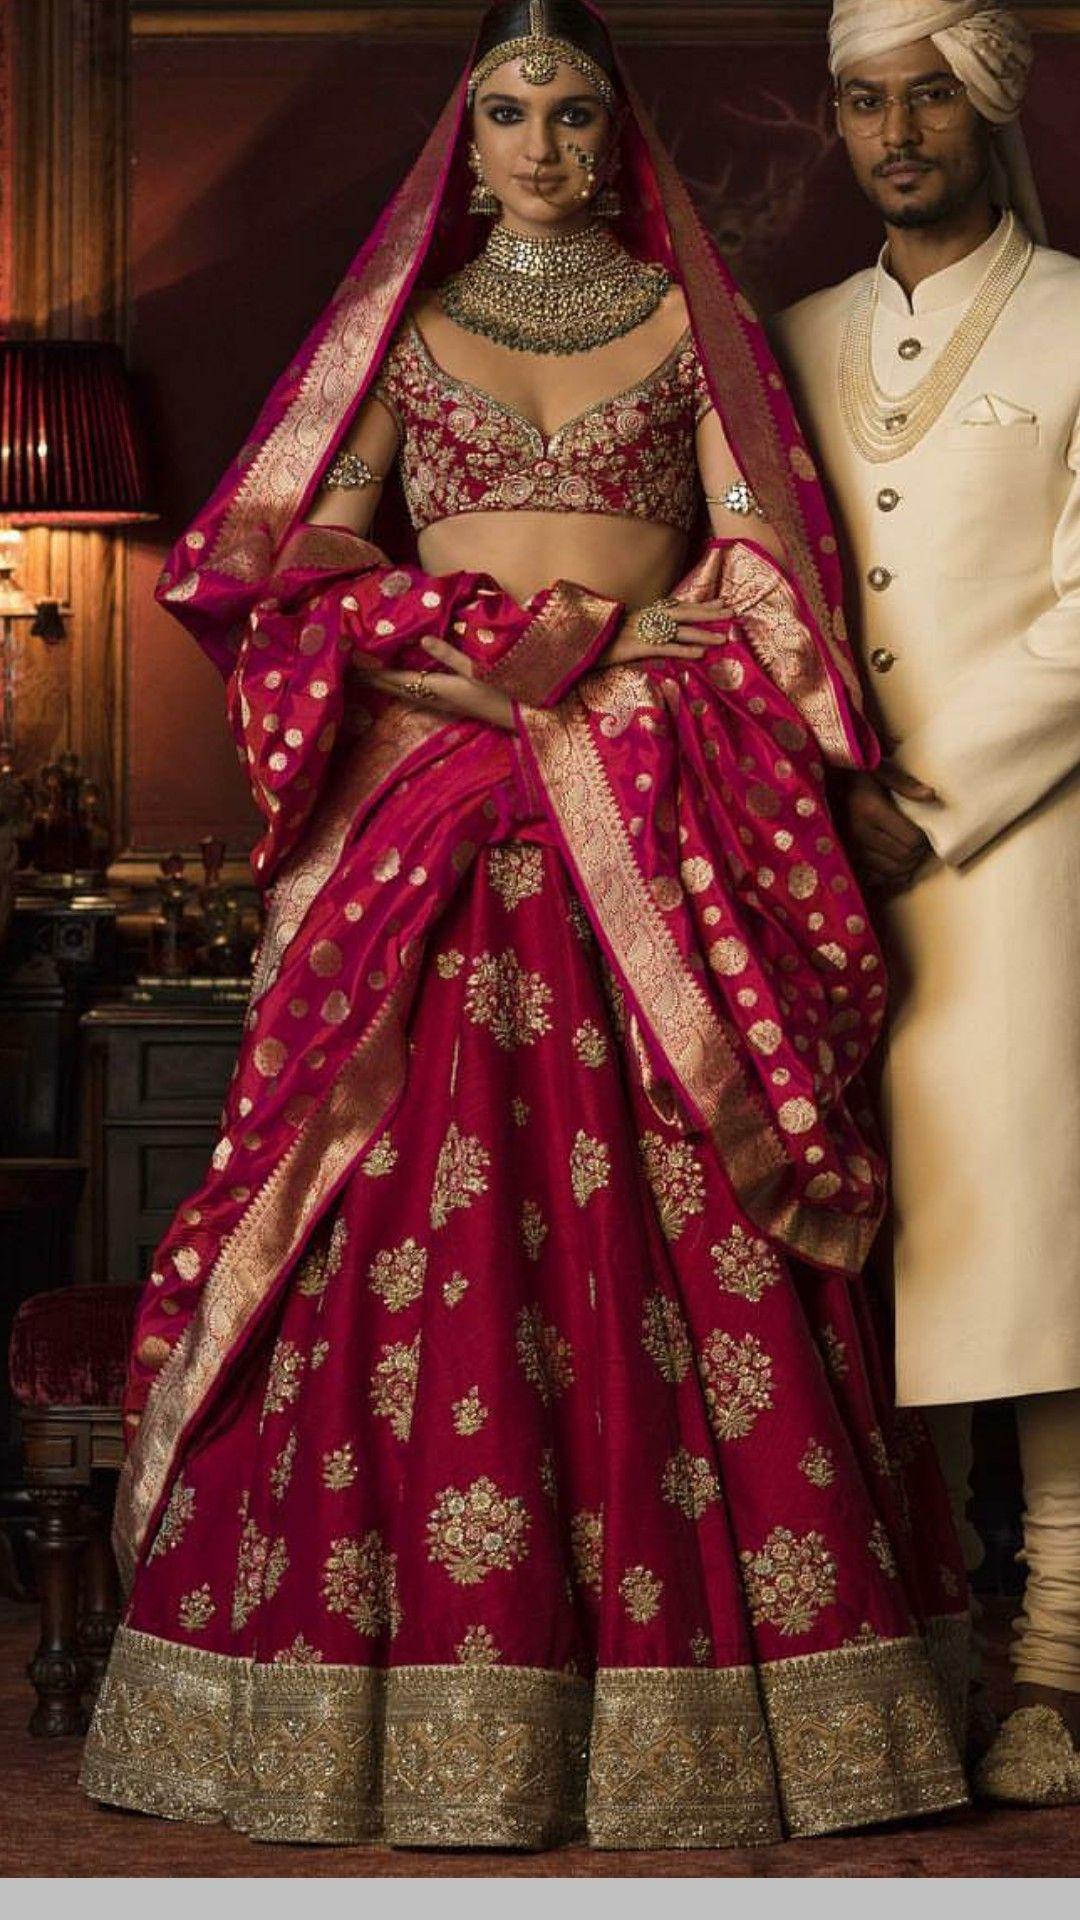 78ac8d1fbe7fc0 Sabyasachi bride in magenta colour lehenga teamed with magenta benarasi  dupatta - royal and classy | wedding inspiration | wedding venues in Mumbai  ...